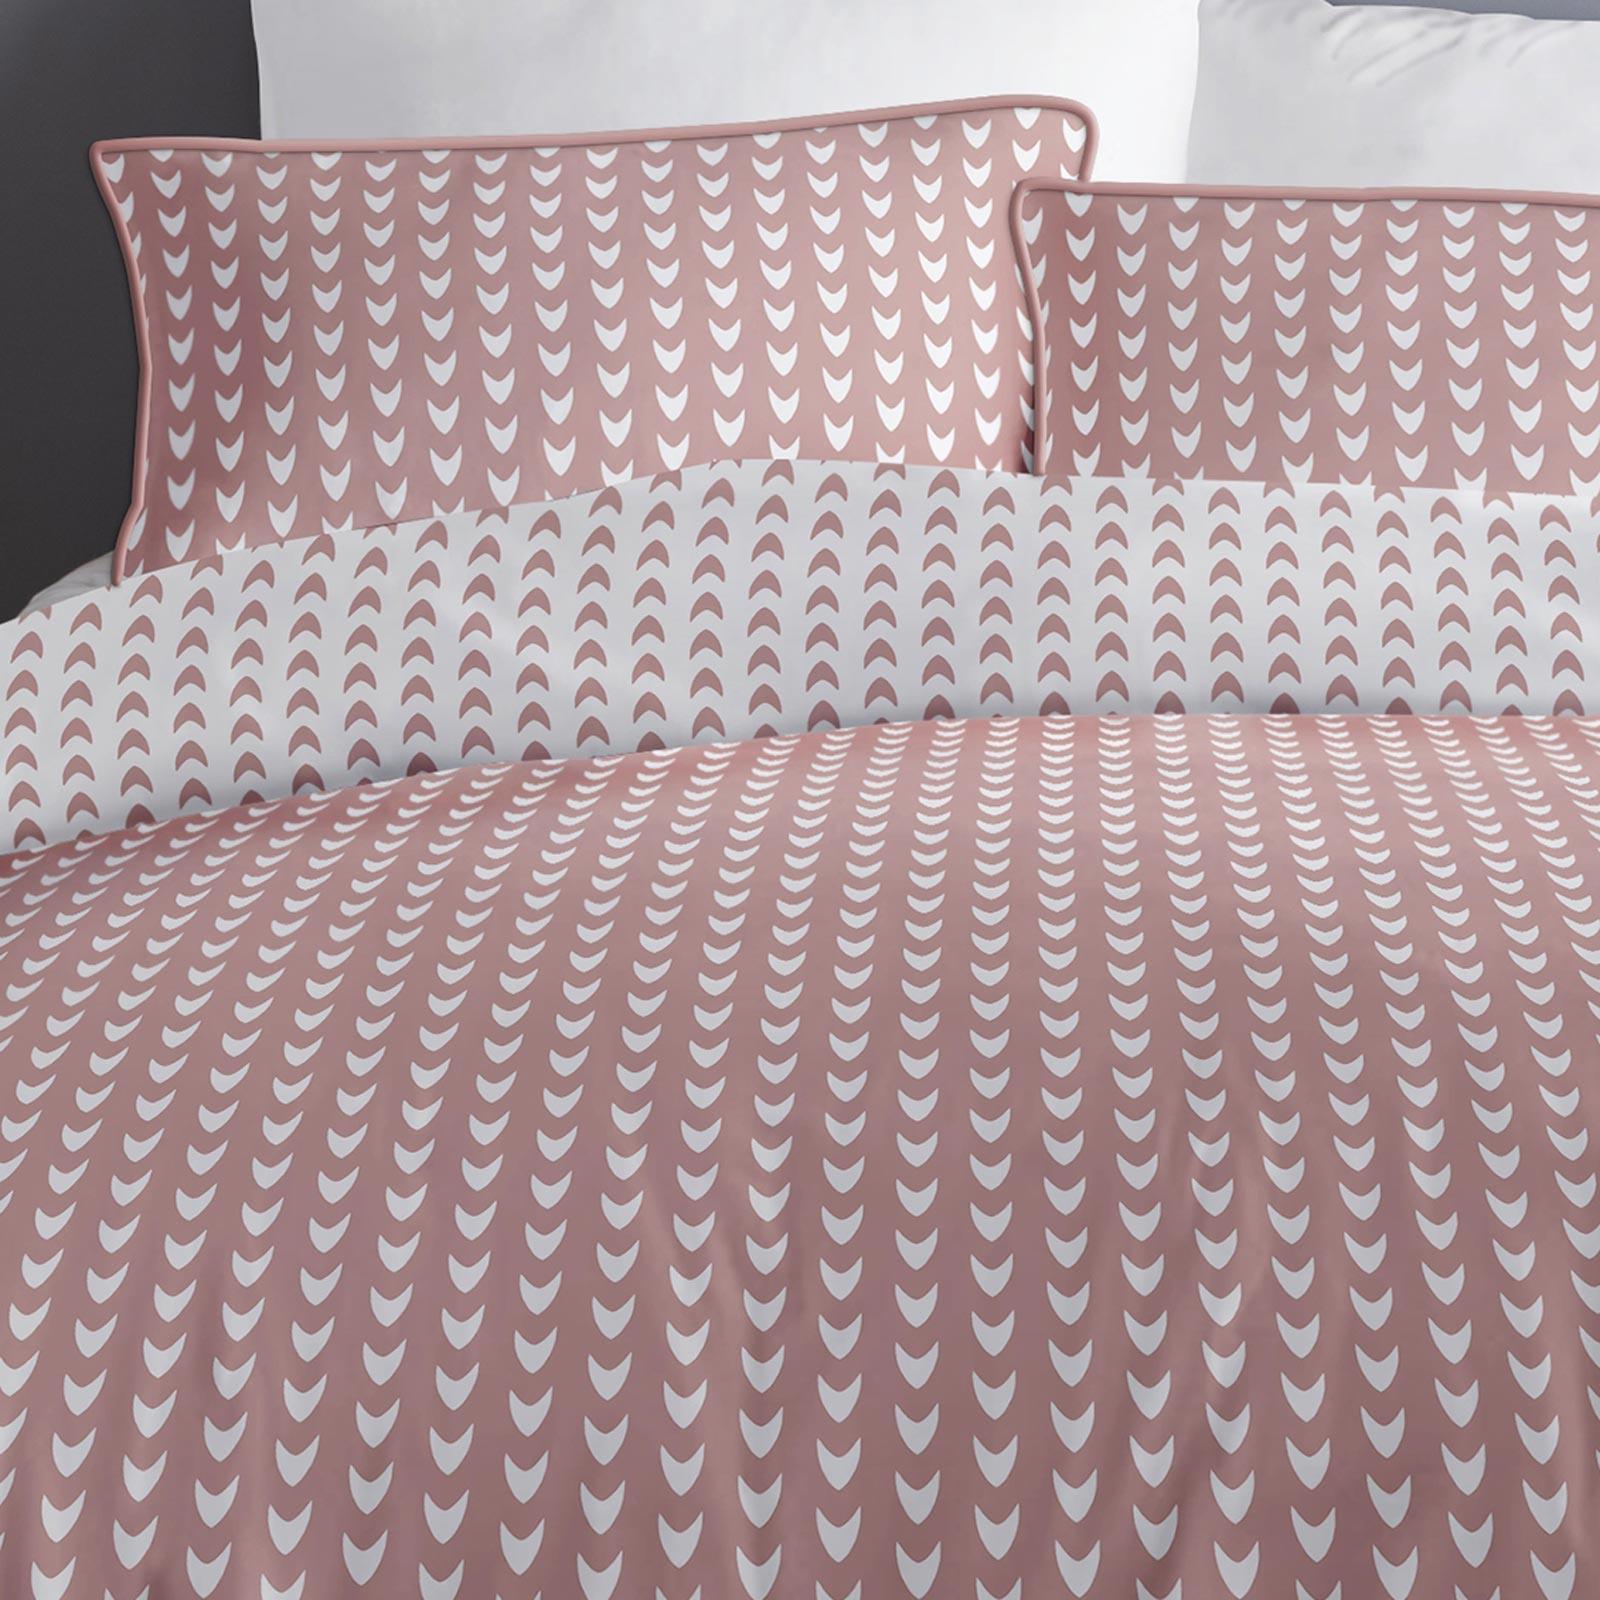 Blush-fundas-nordicas-Rosa-Geometrico-100-Algodon-Edredon-Reversible-conjuntos-de-cama miniatura 8